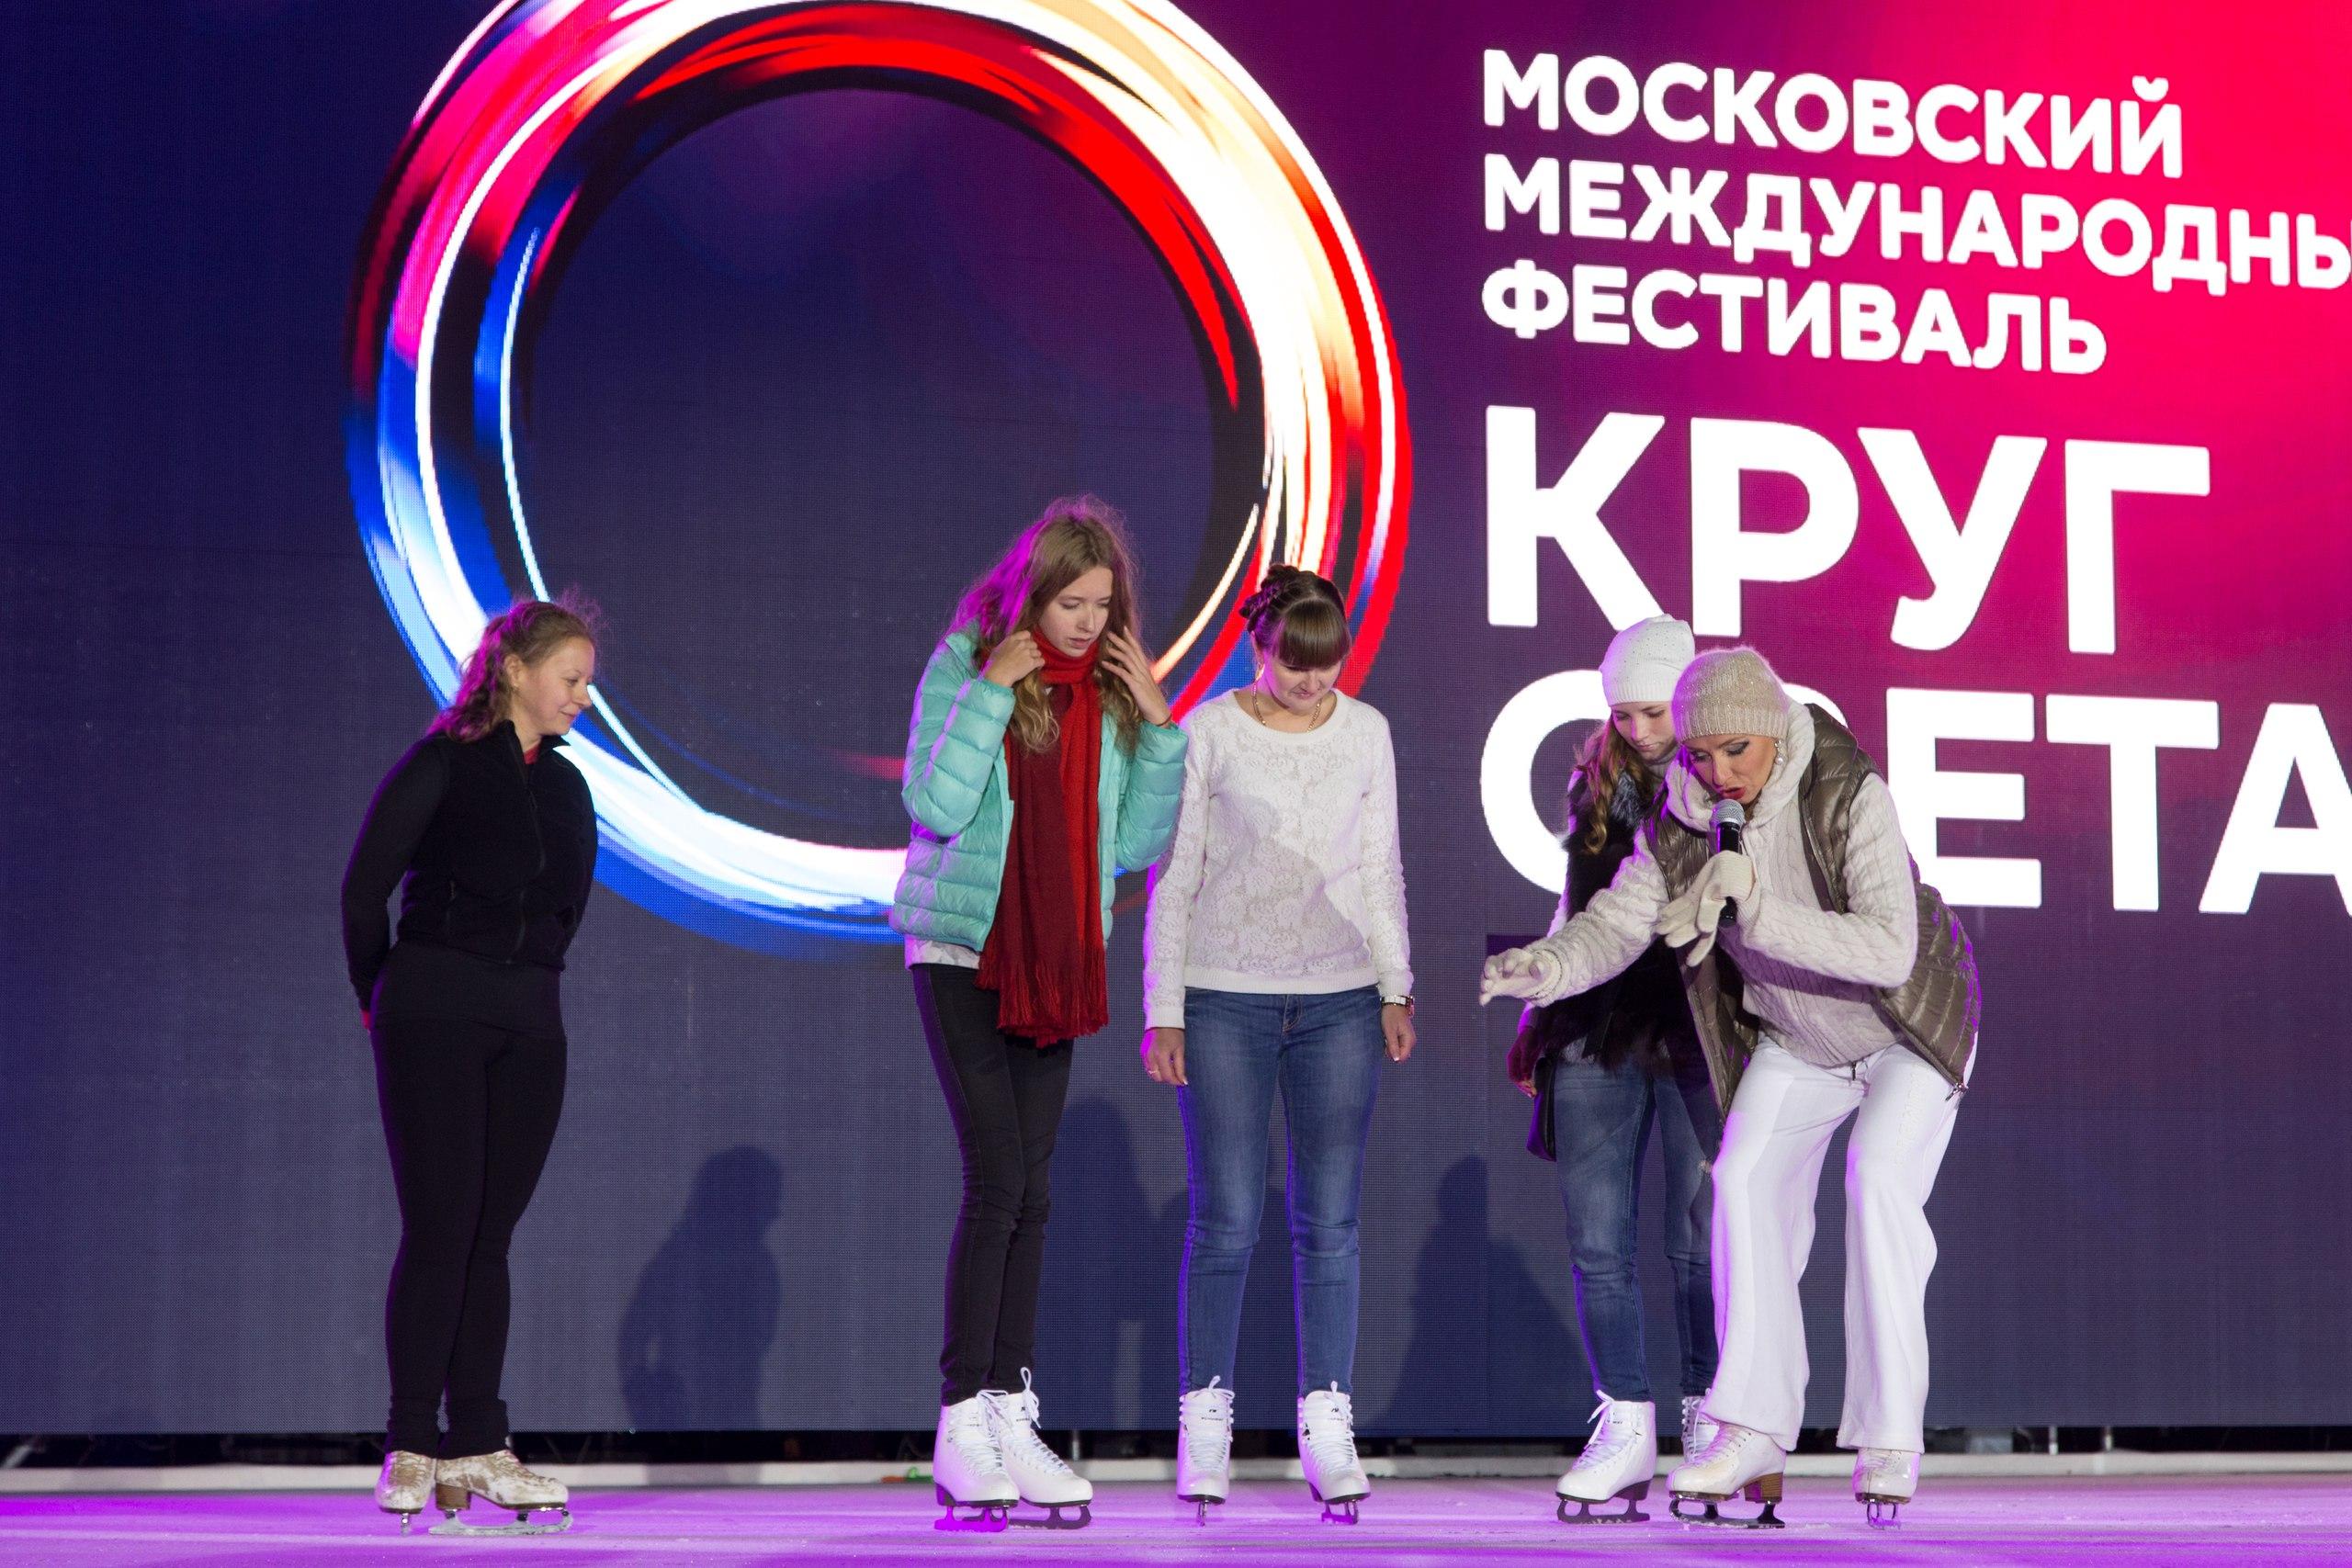 Световое шоу Татьяны Навки - Страница 7 A0b79b8d9e6b